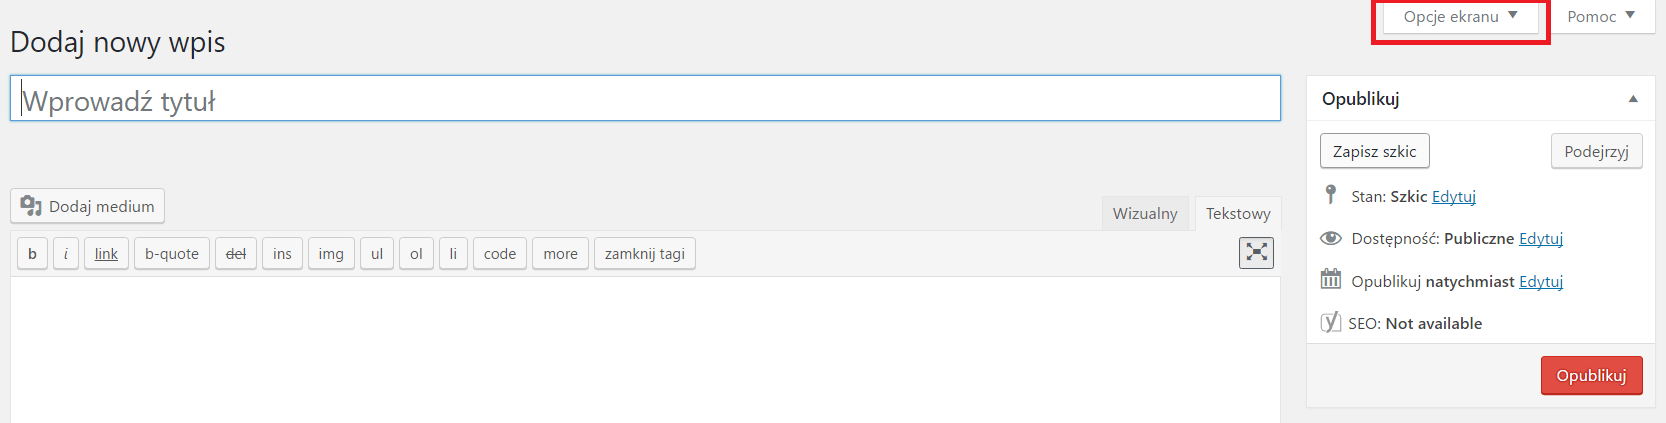 Ukryte funkcje WordPress - opcje ekranu